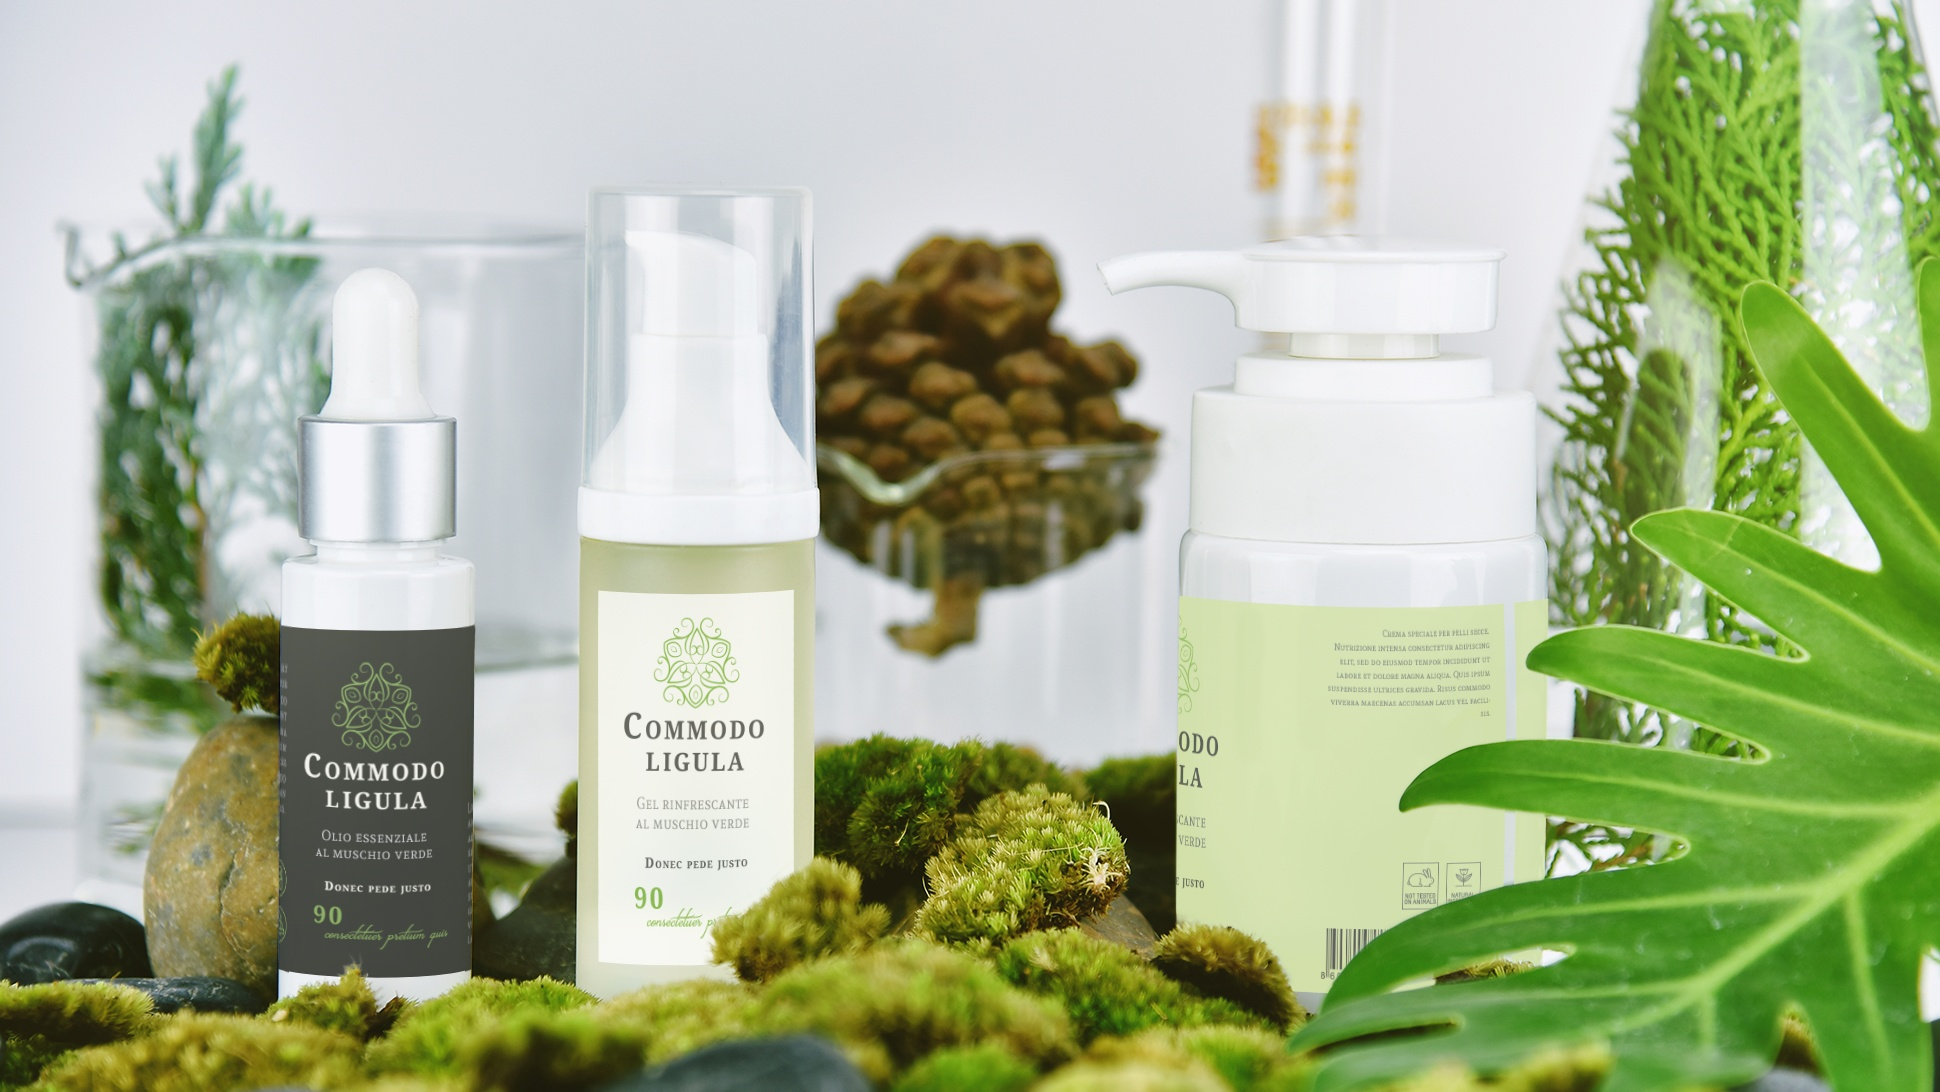 Etichette impermeabili e green